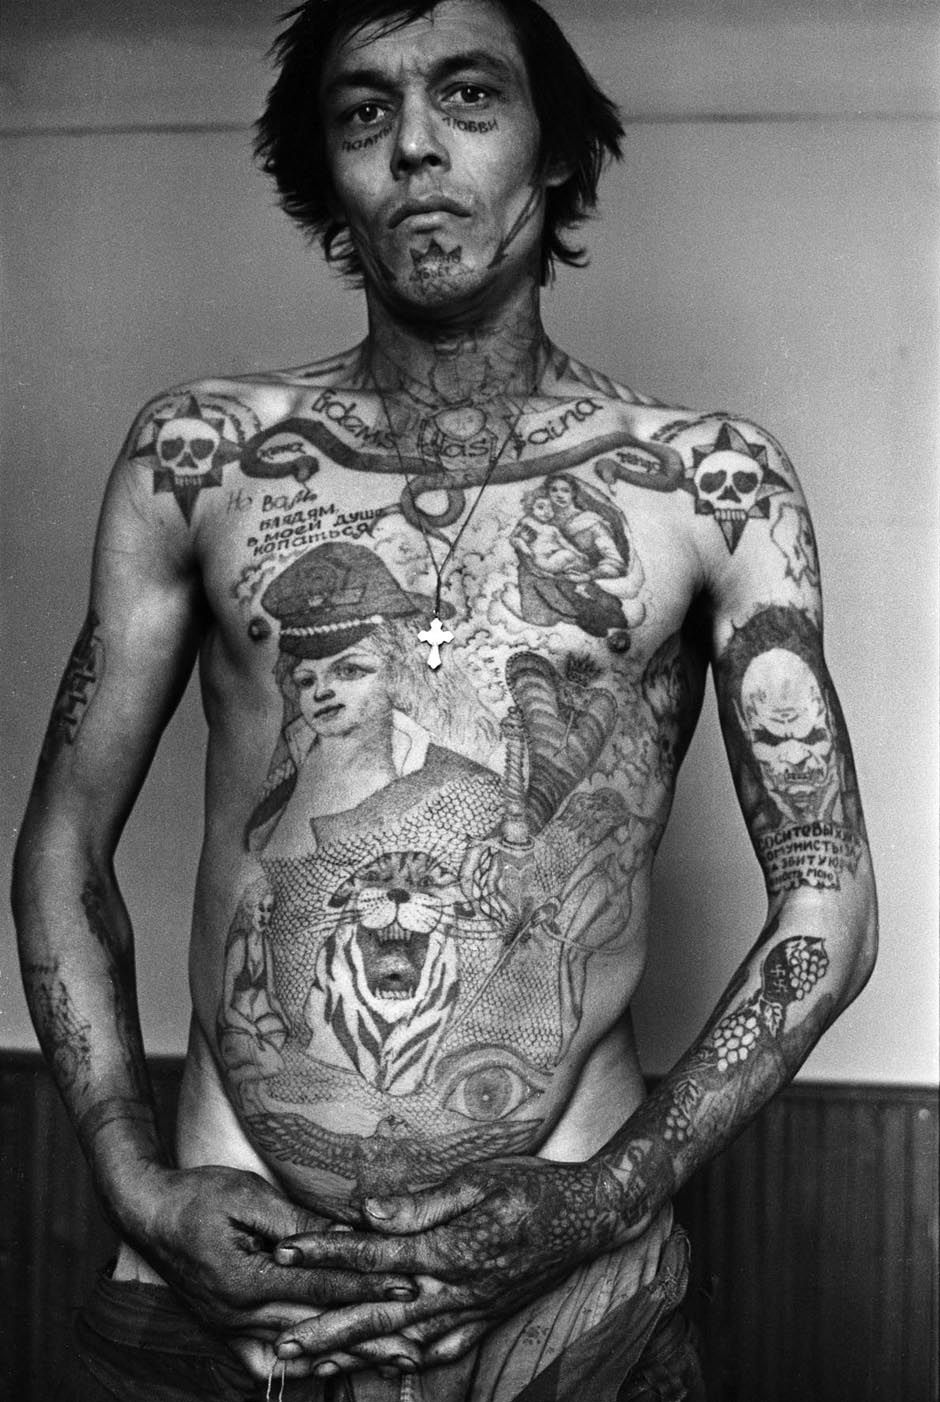 tatouage-encyclopedie-criminel-russe-prison-01.jpg